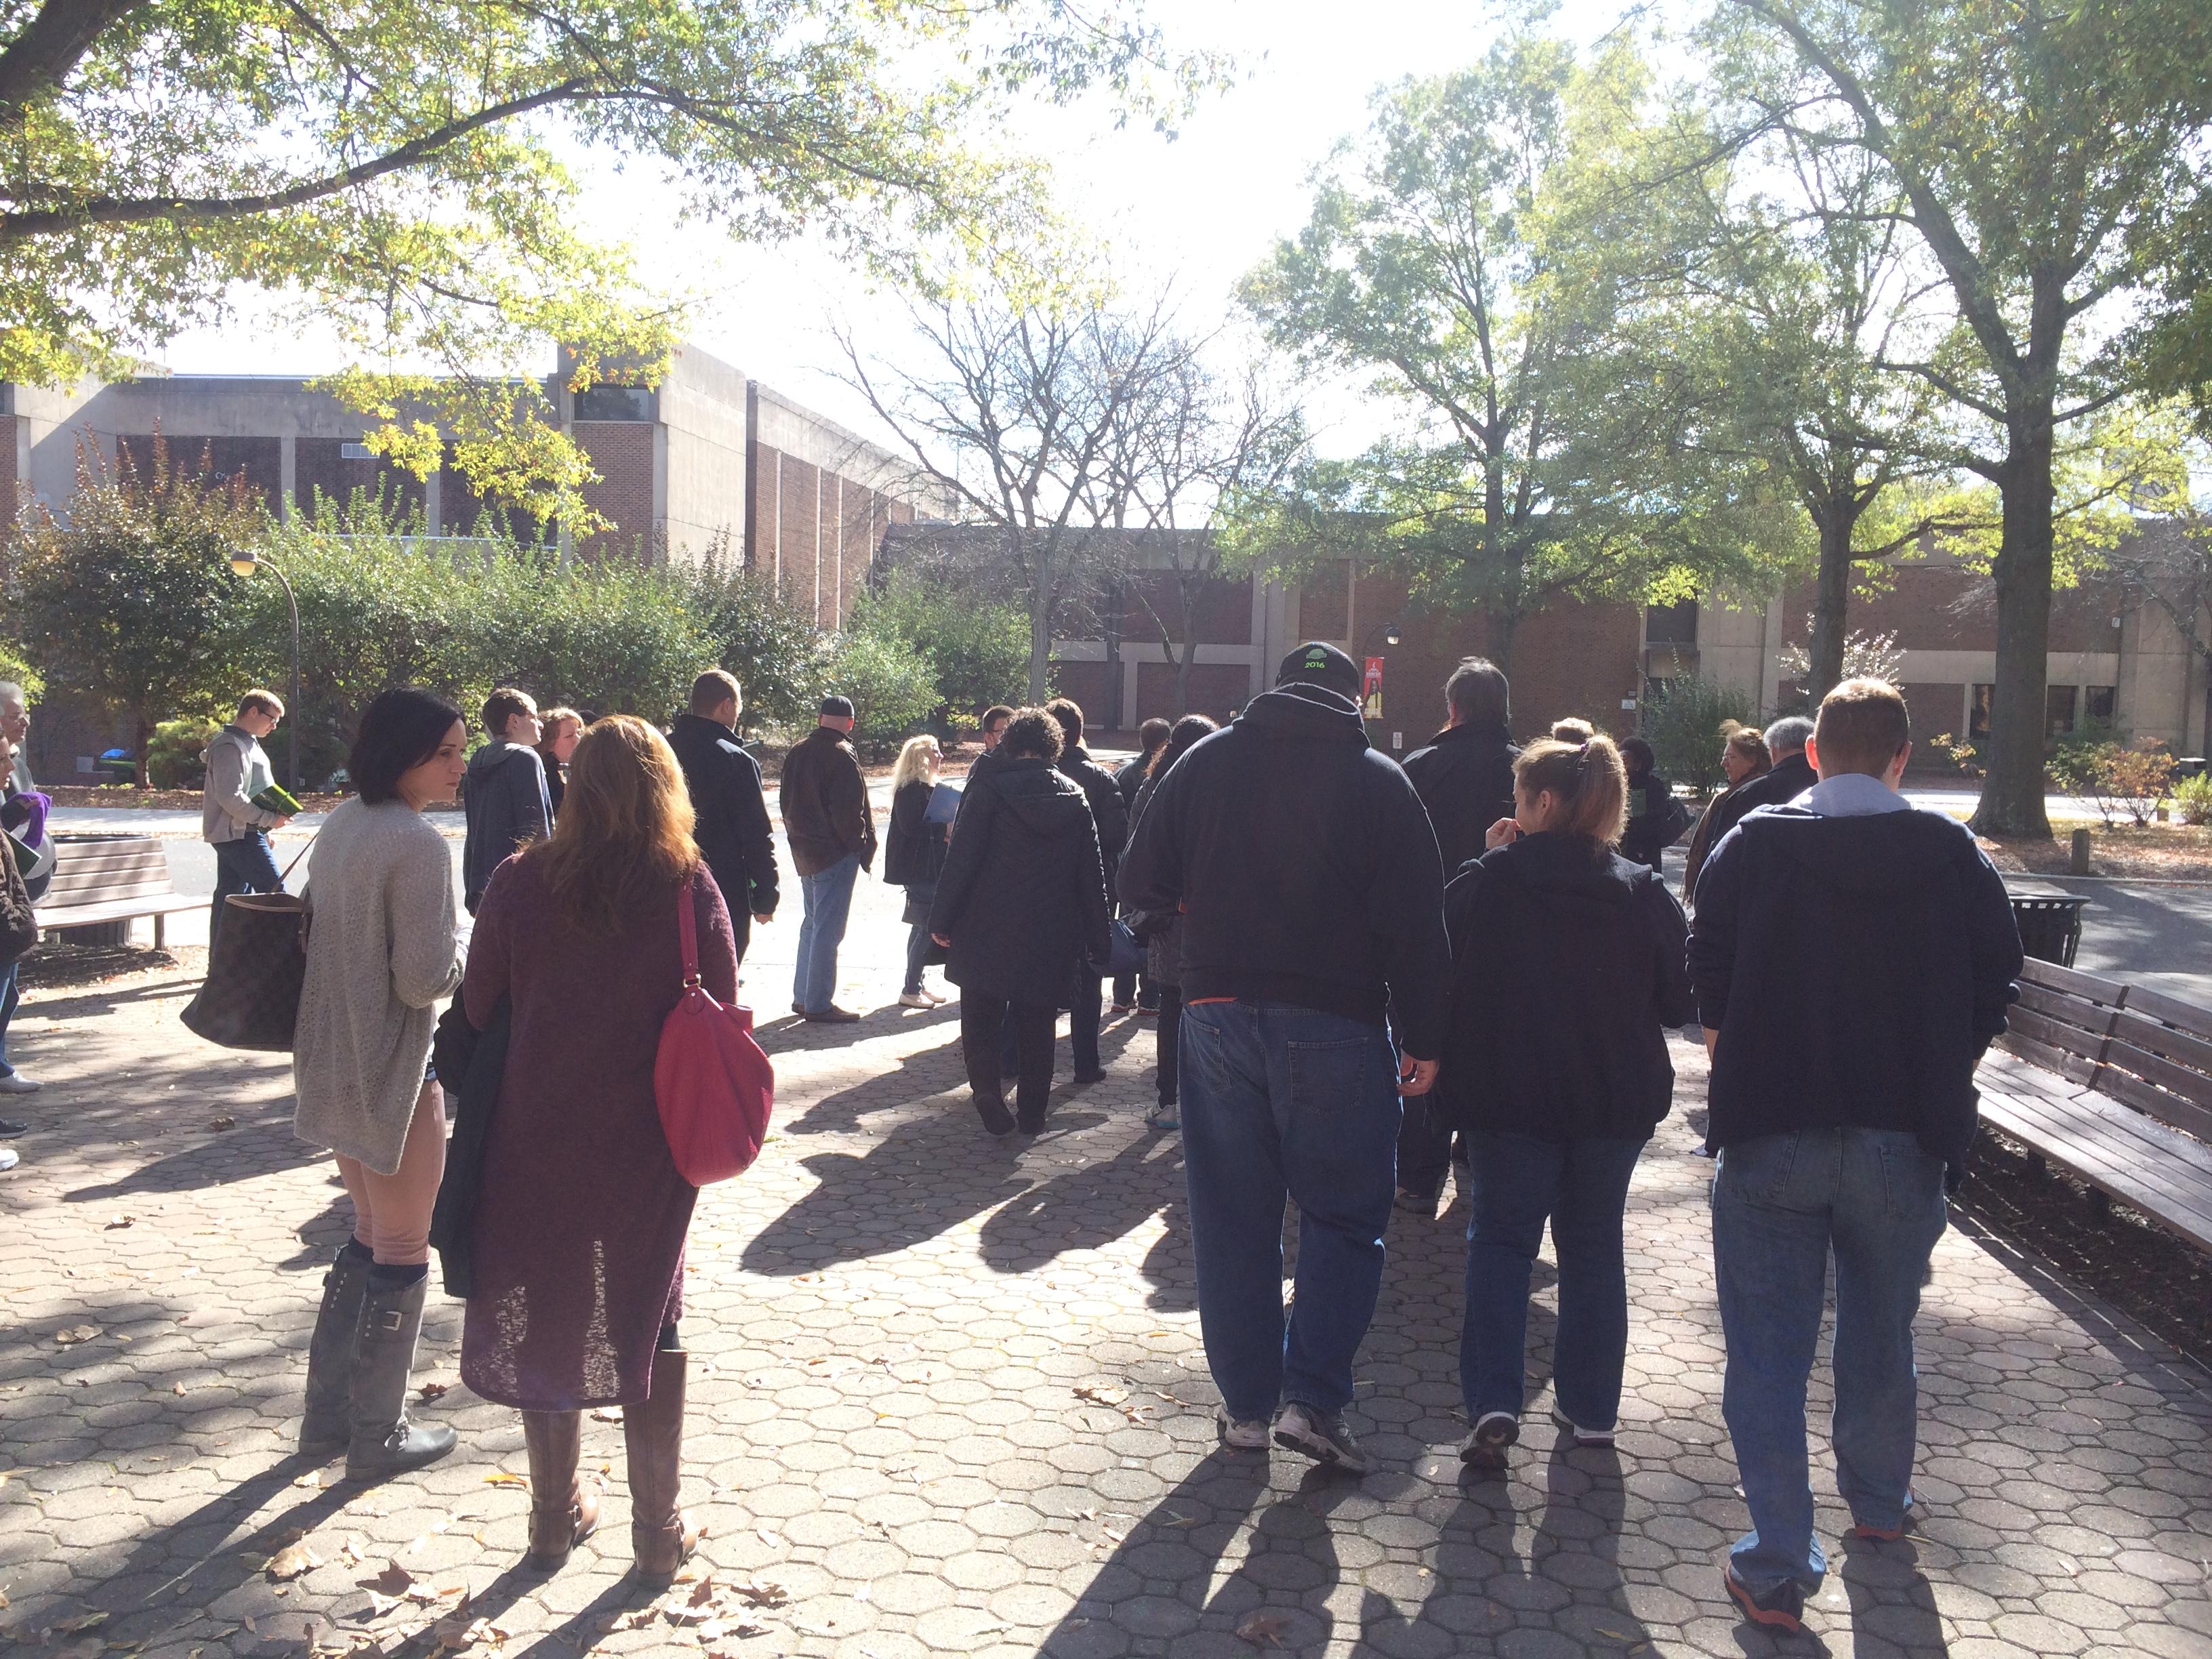 Mercer County Community College's DREAM Program College Tour